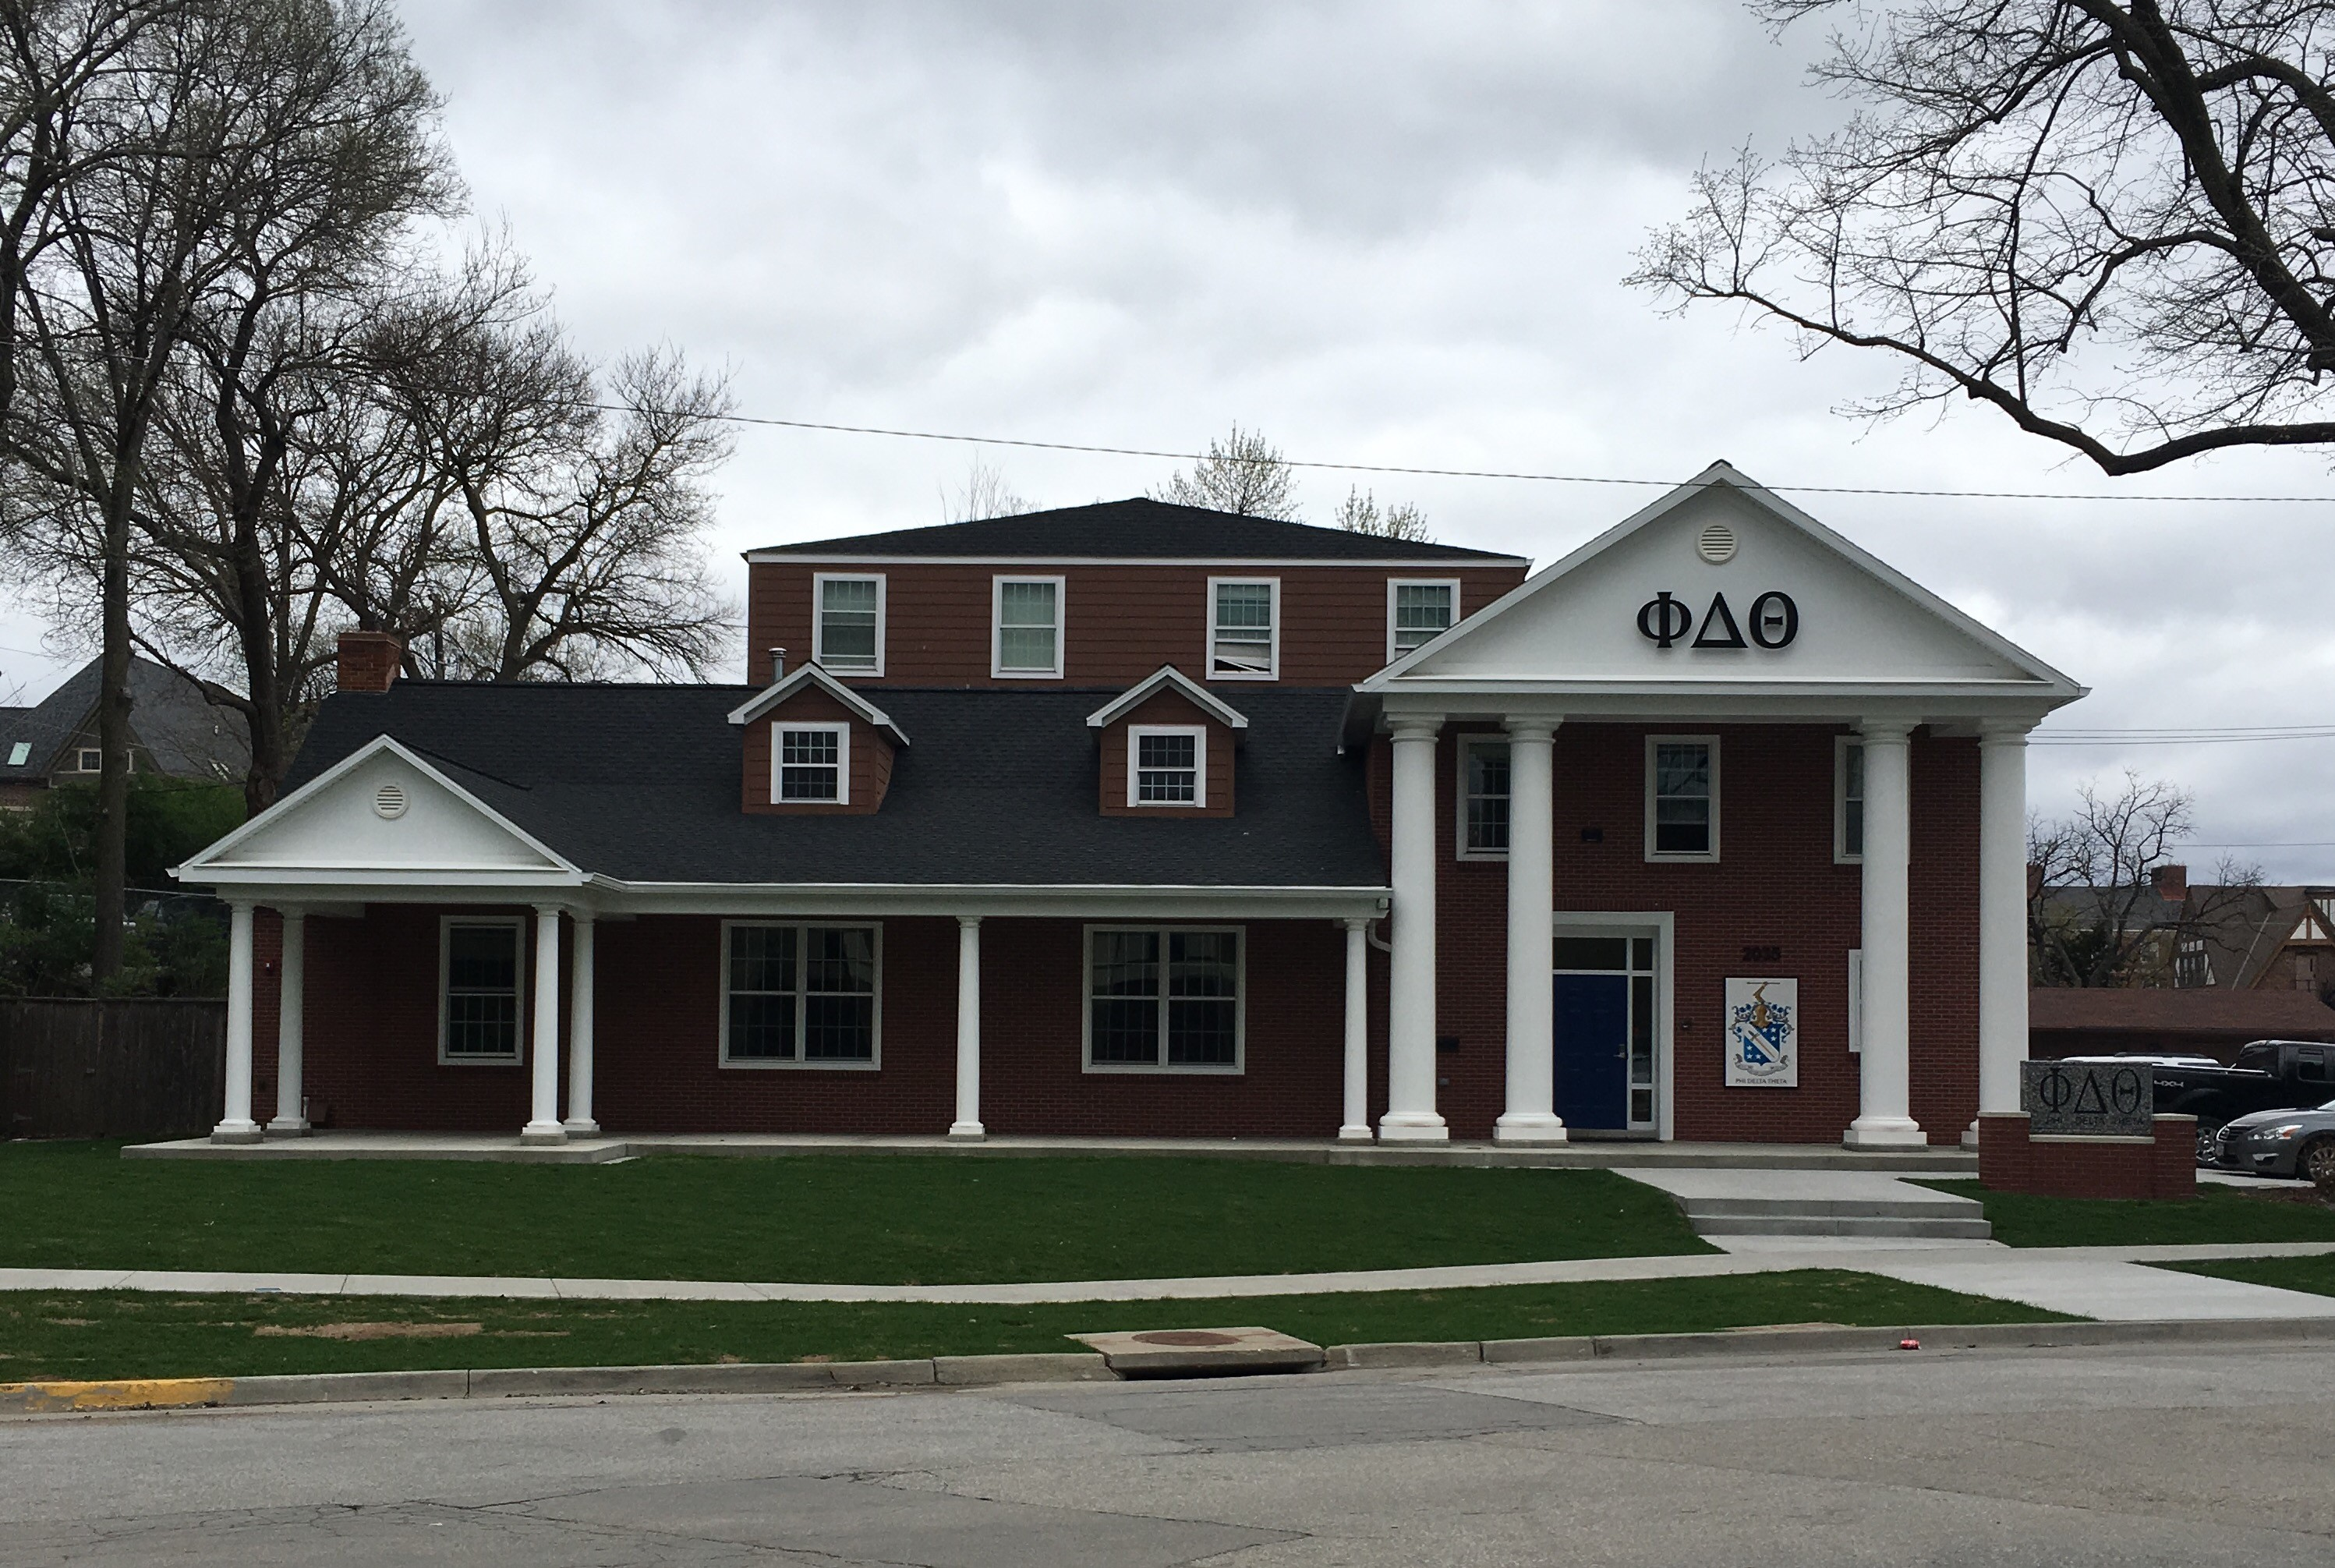 House Plan Maker Phi Delta Theta Iowa Gamma Office Of Sorority And